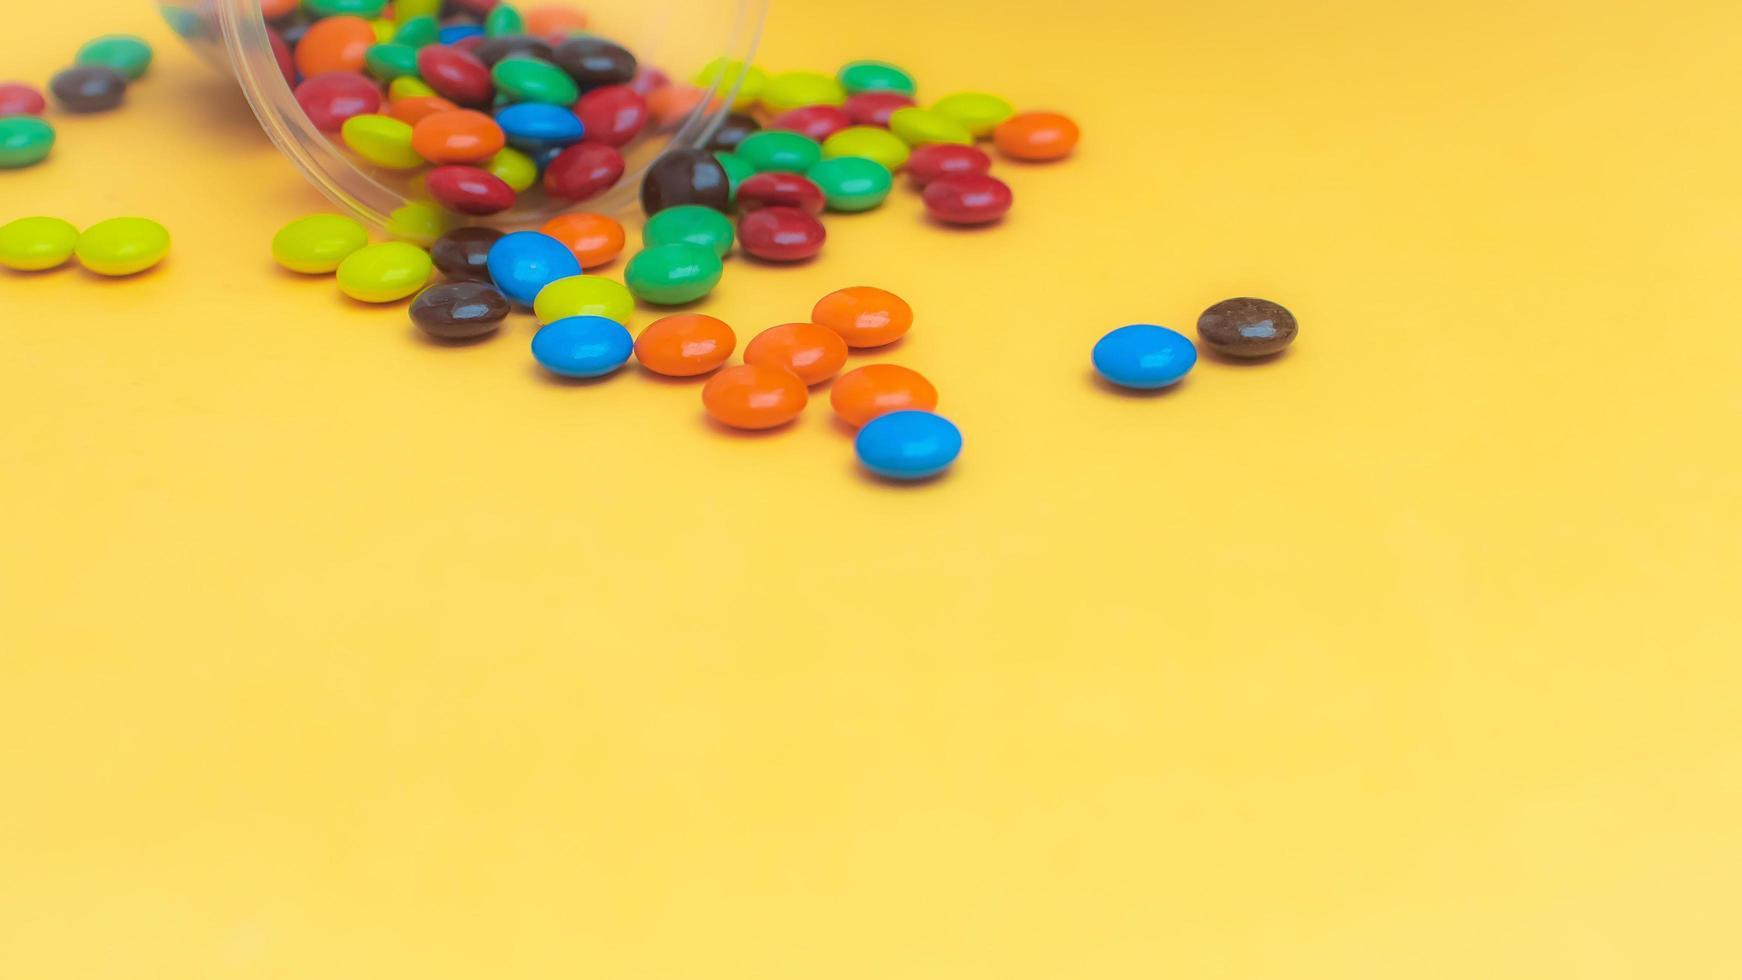 Chocolate coated candies photo